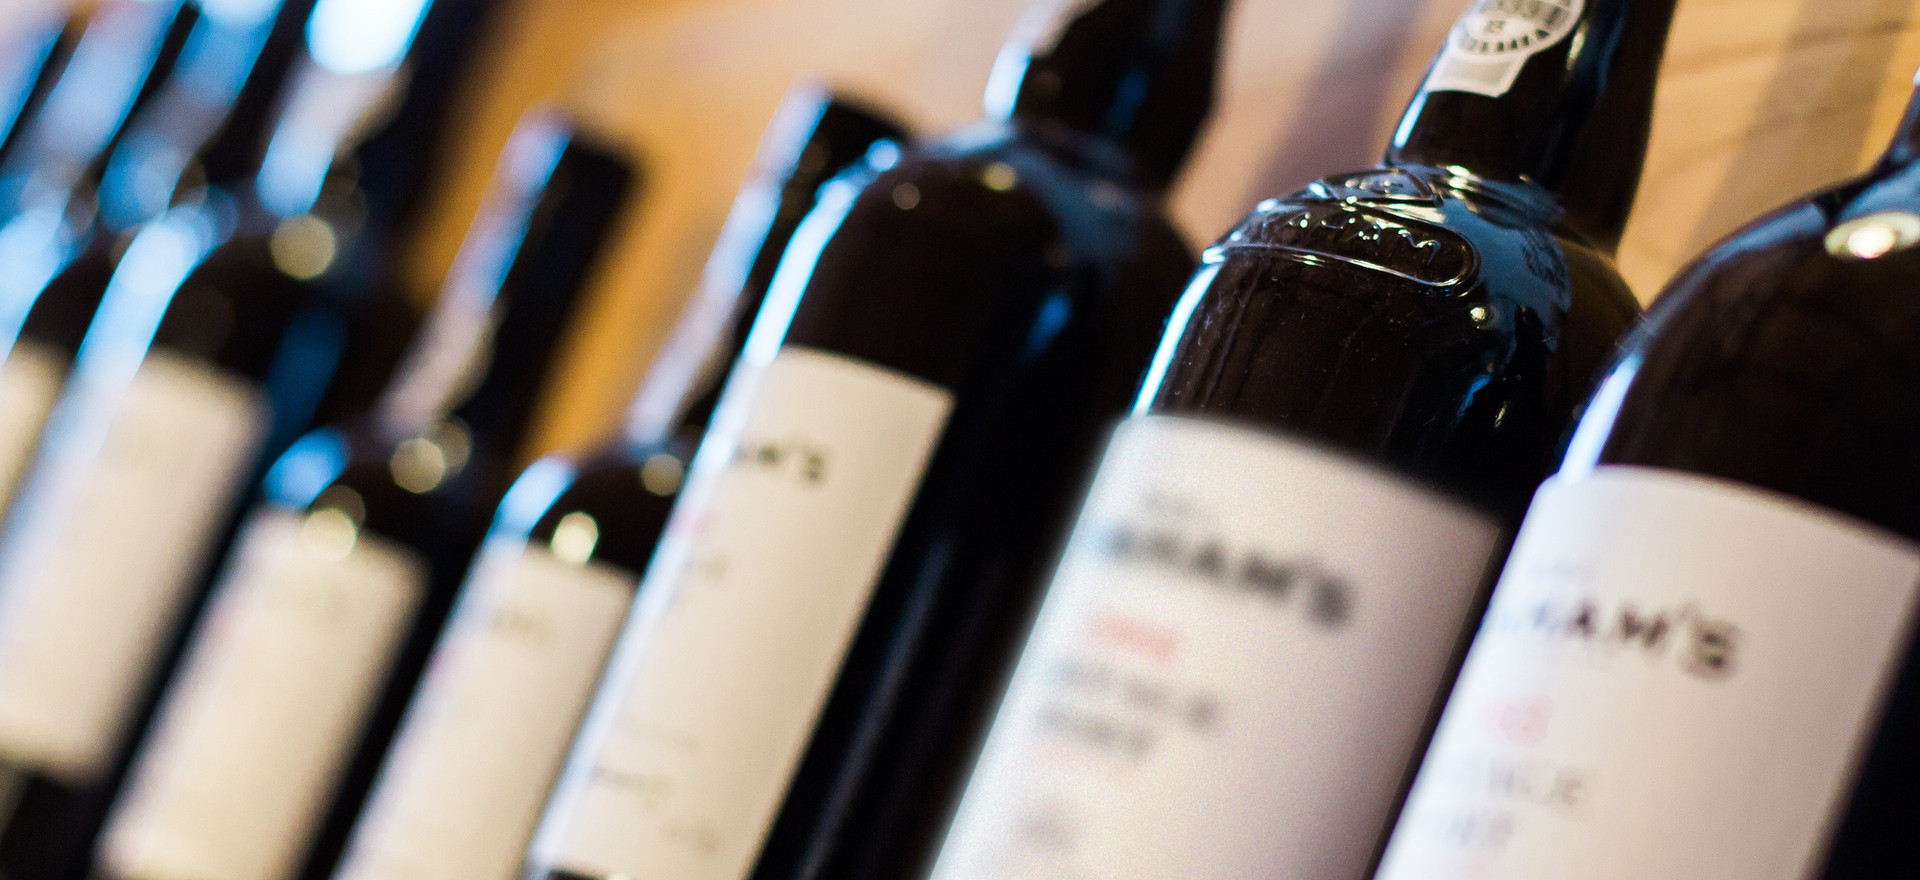 Bottiglie di vino | club nautico chia